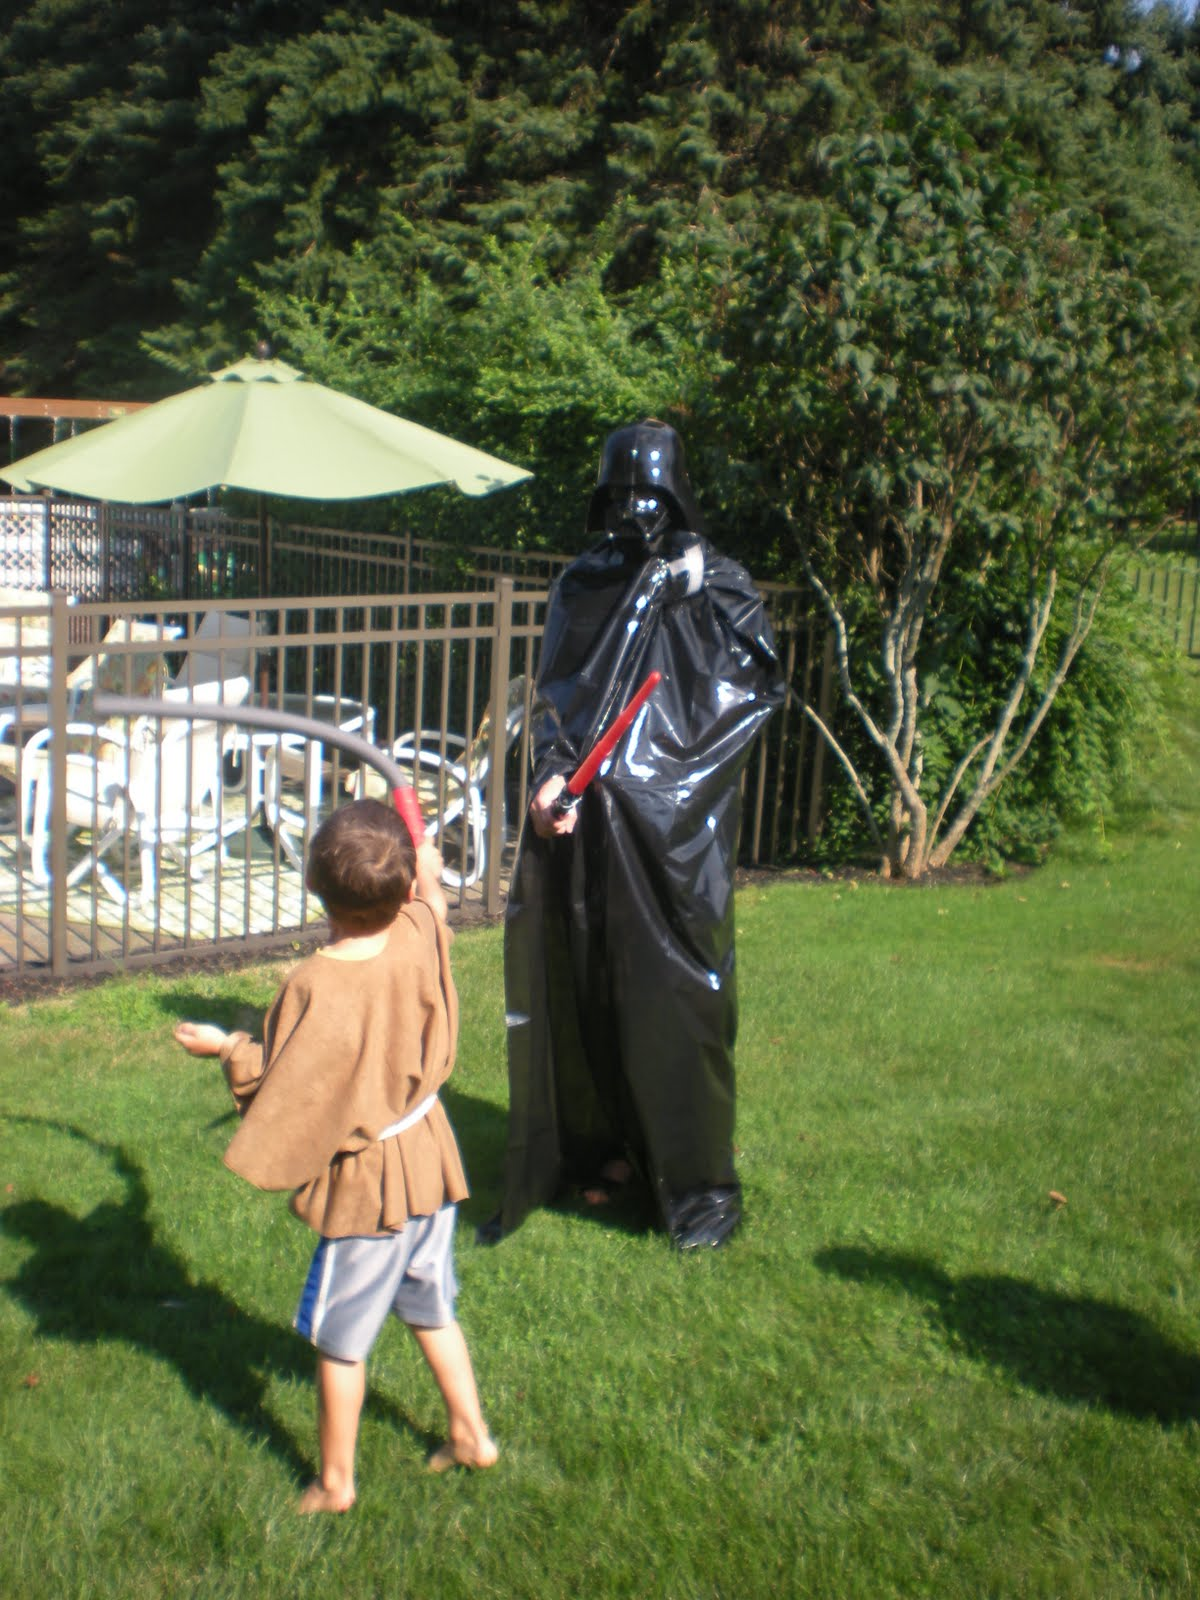 DIY Star Wars Birthday party robes u0026 jedi sticks - Four Generations One Roof & DIY Star Wars Birthday party robes u0026 jedi sticks - Four ...